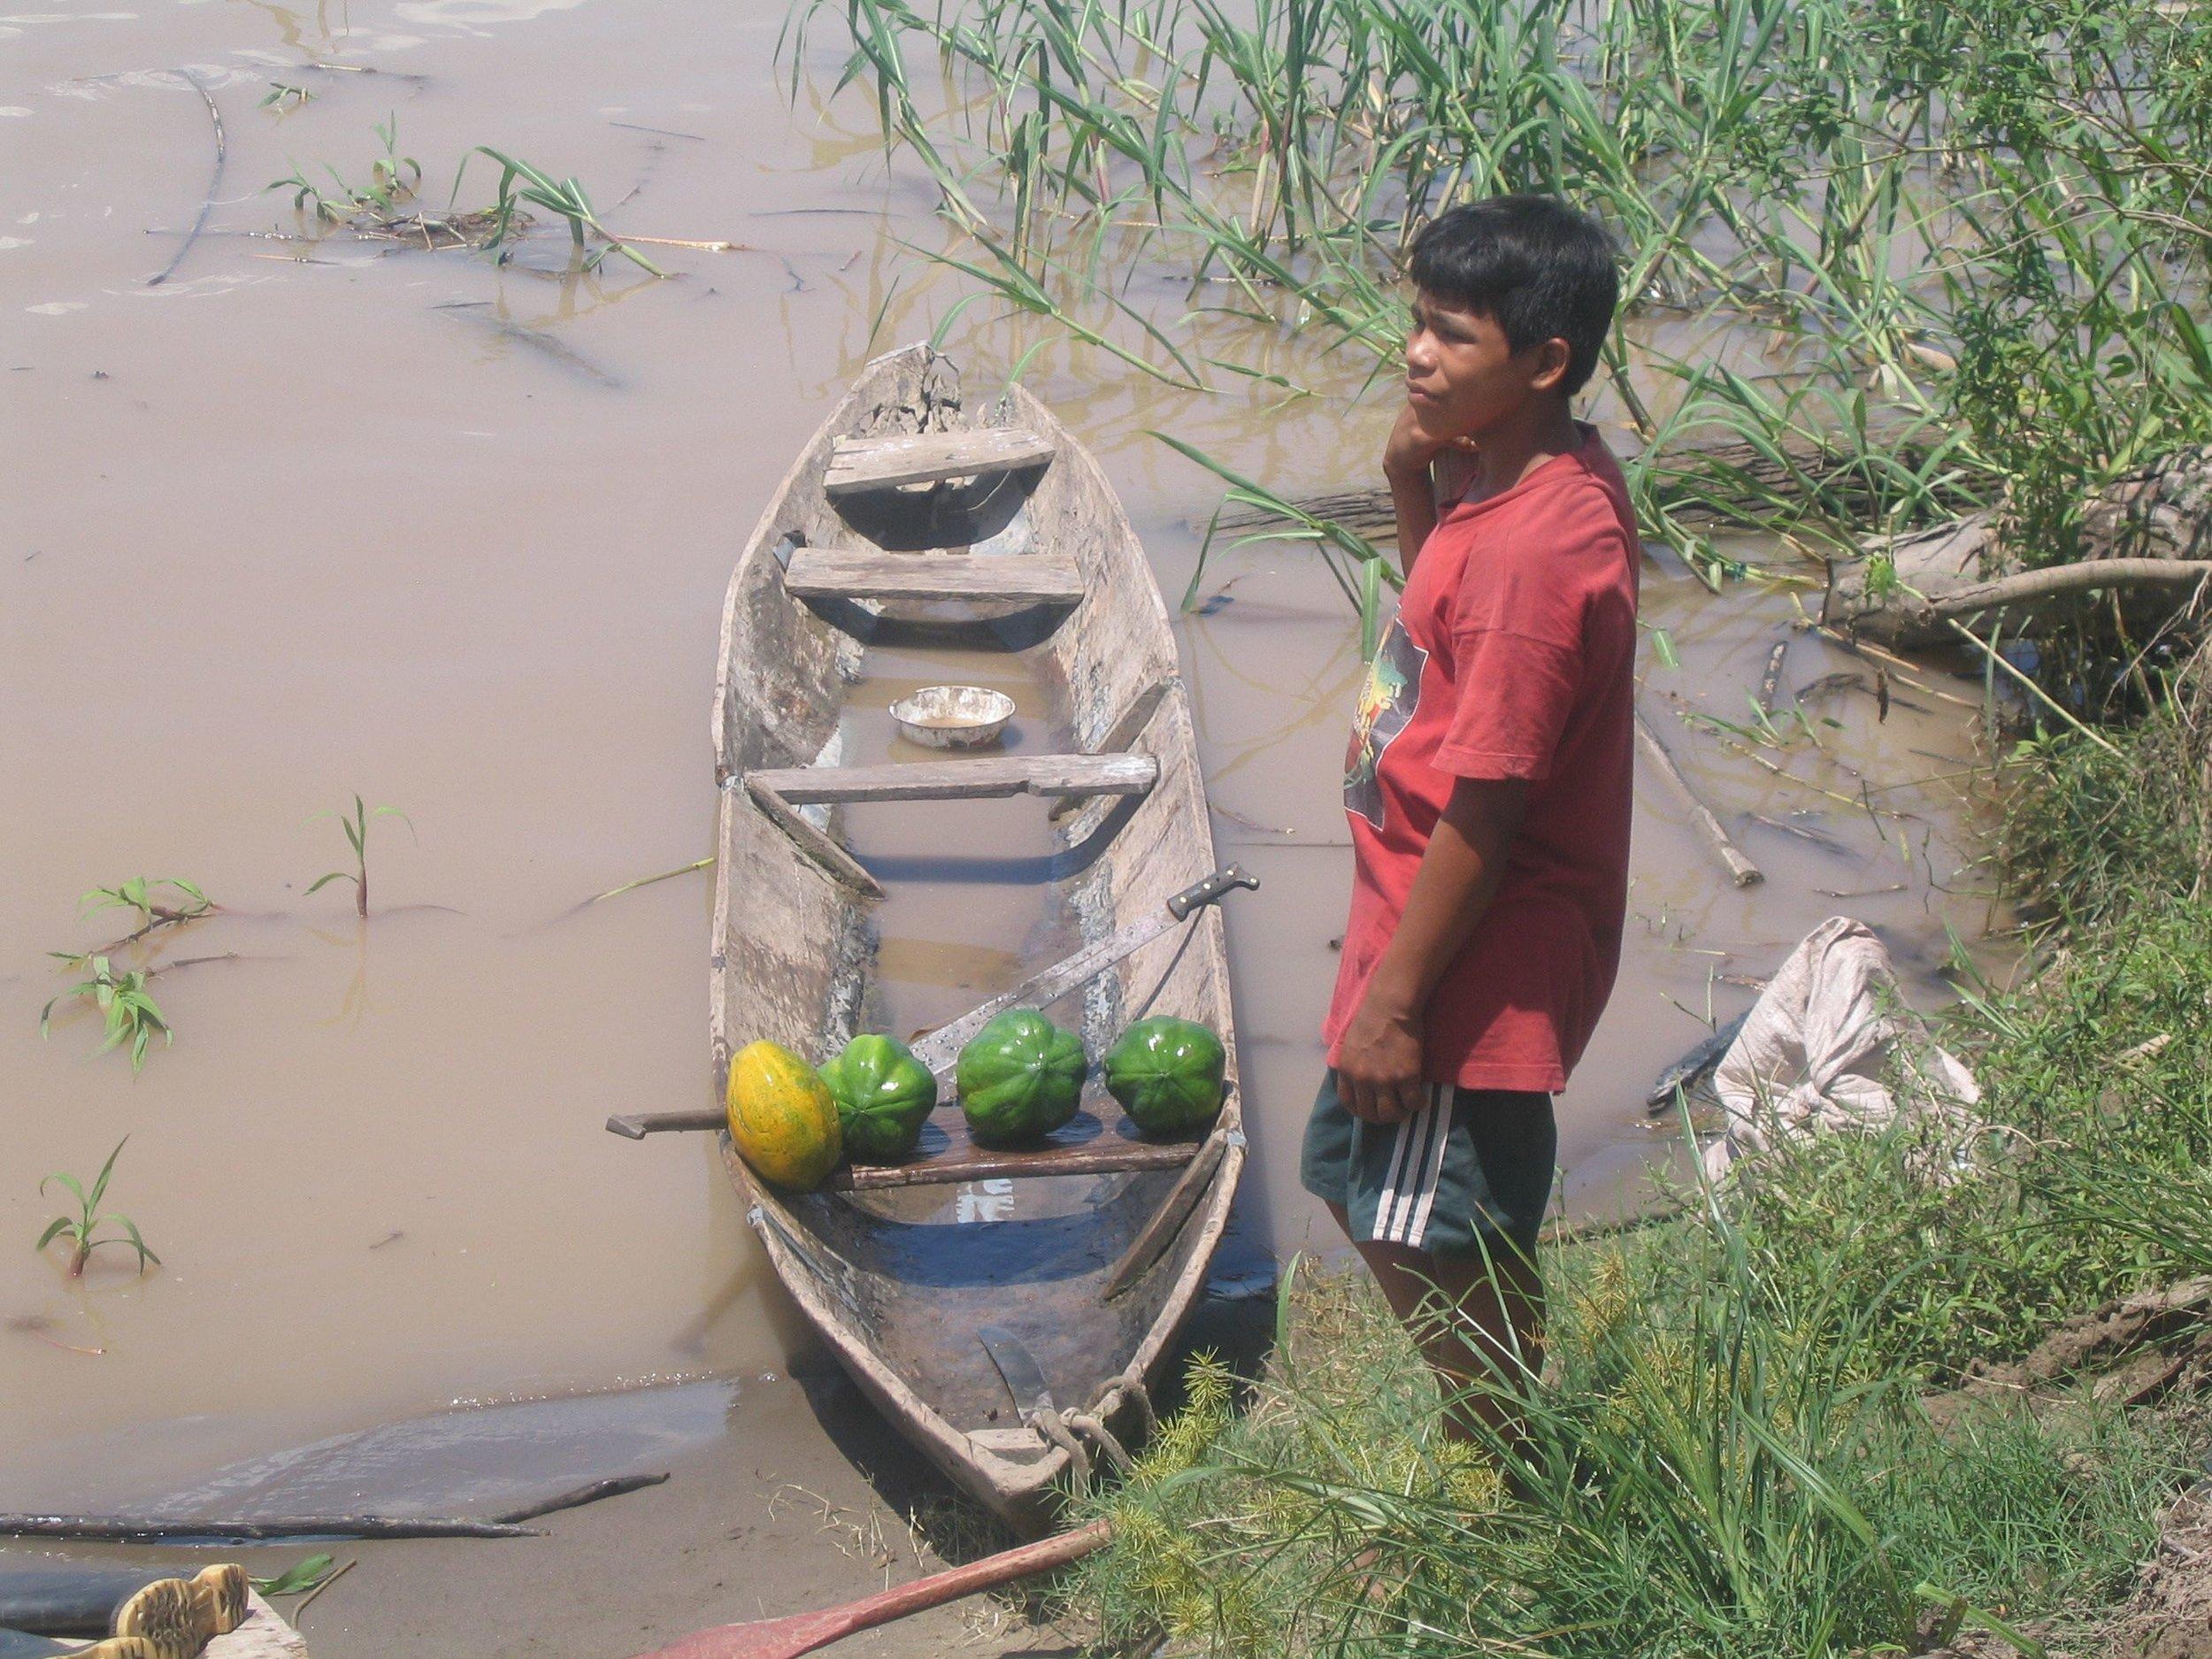 fruit boat peru.jpg